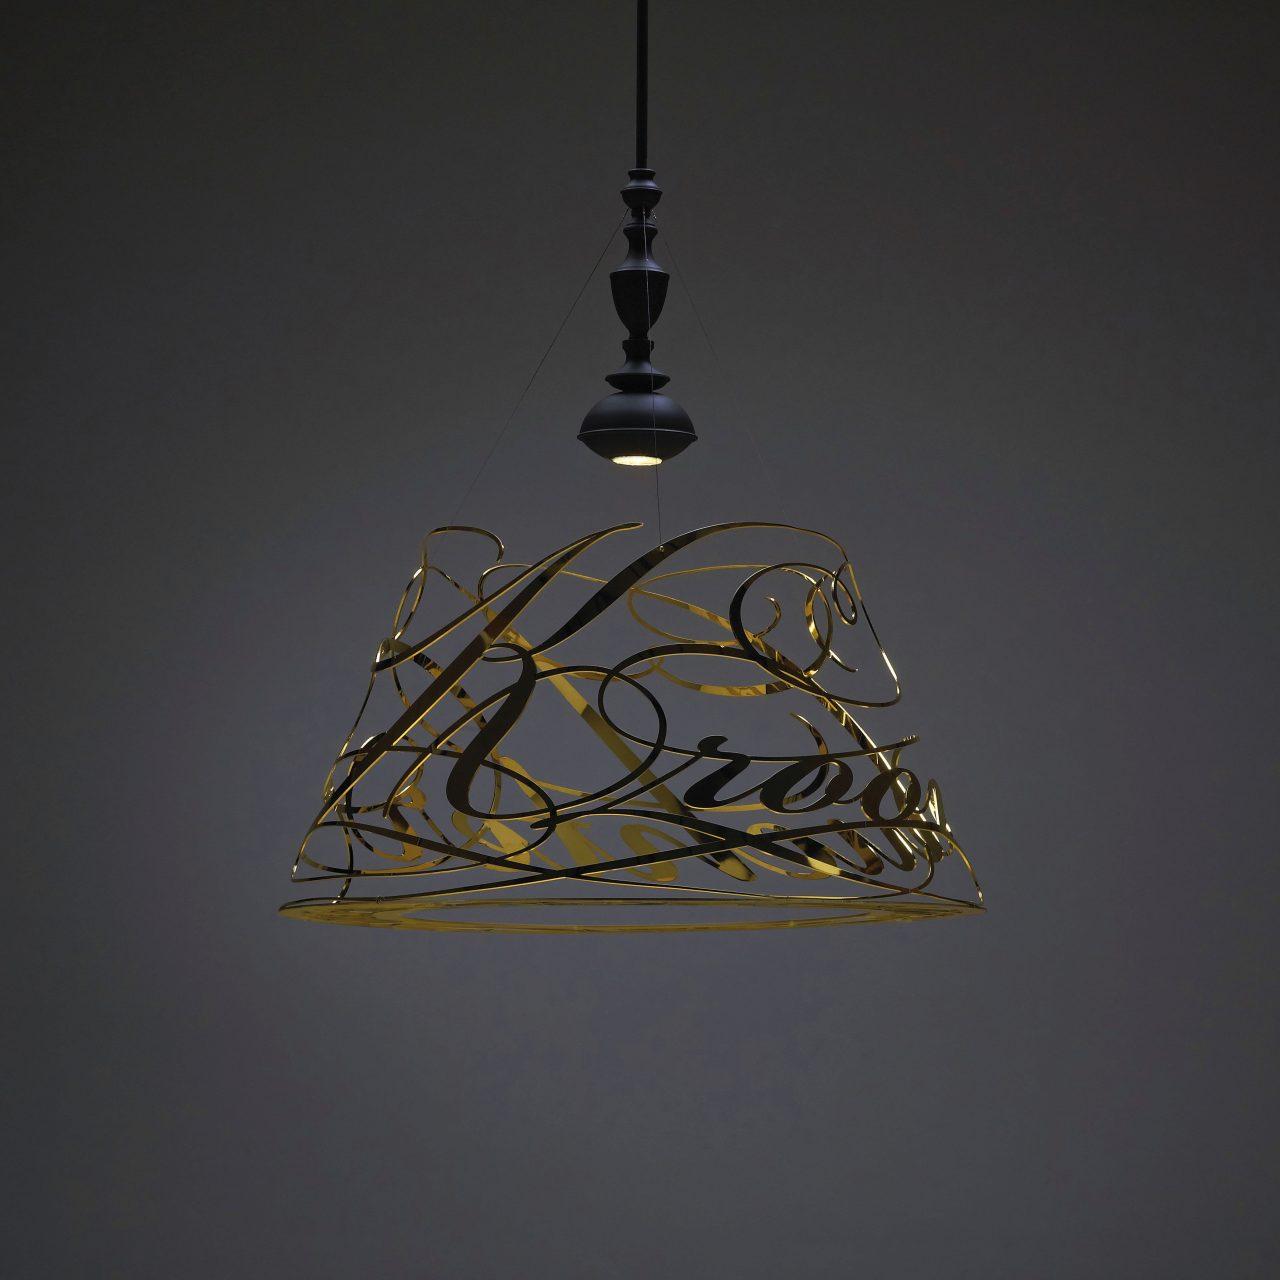 jacco-maris-ideefixe-4200x4200px